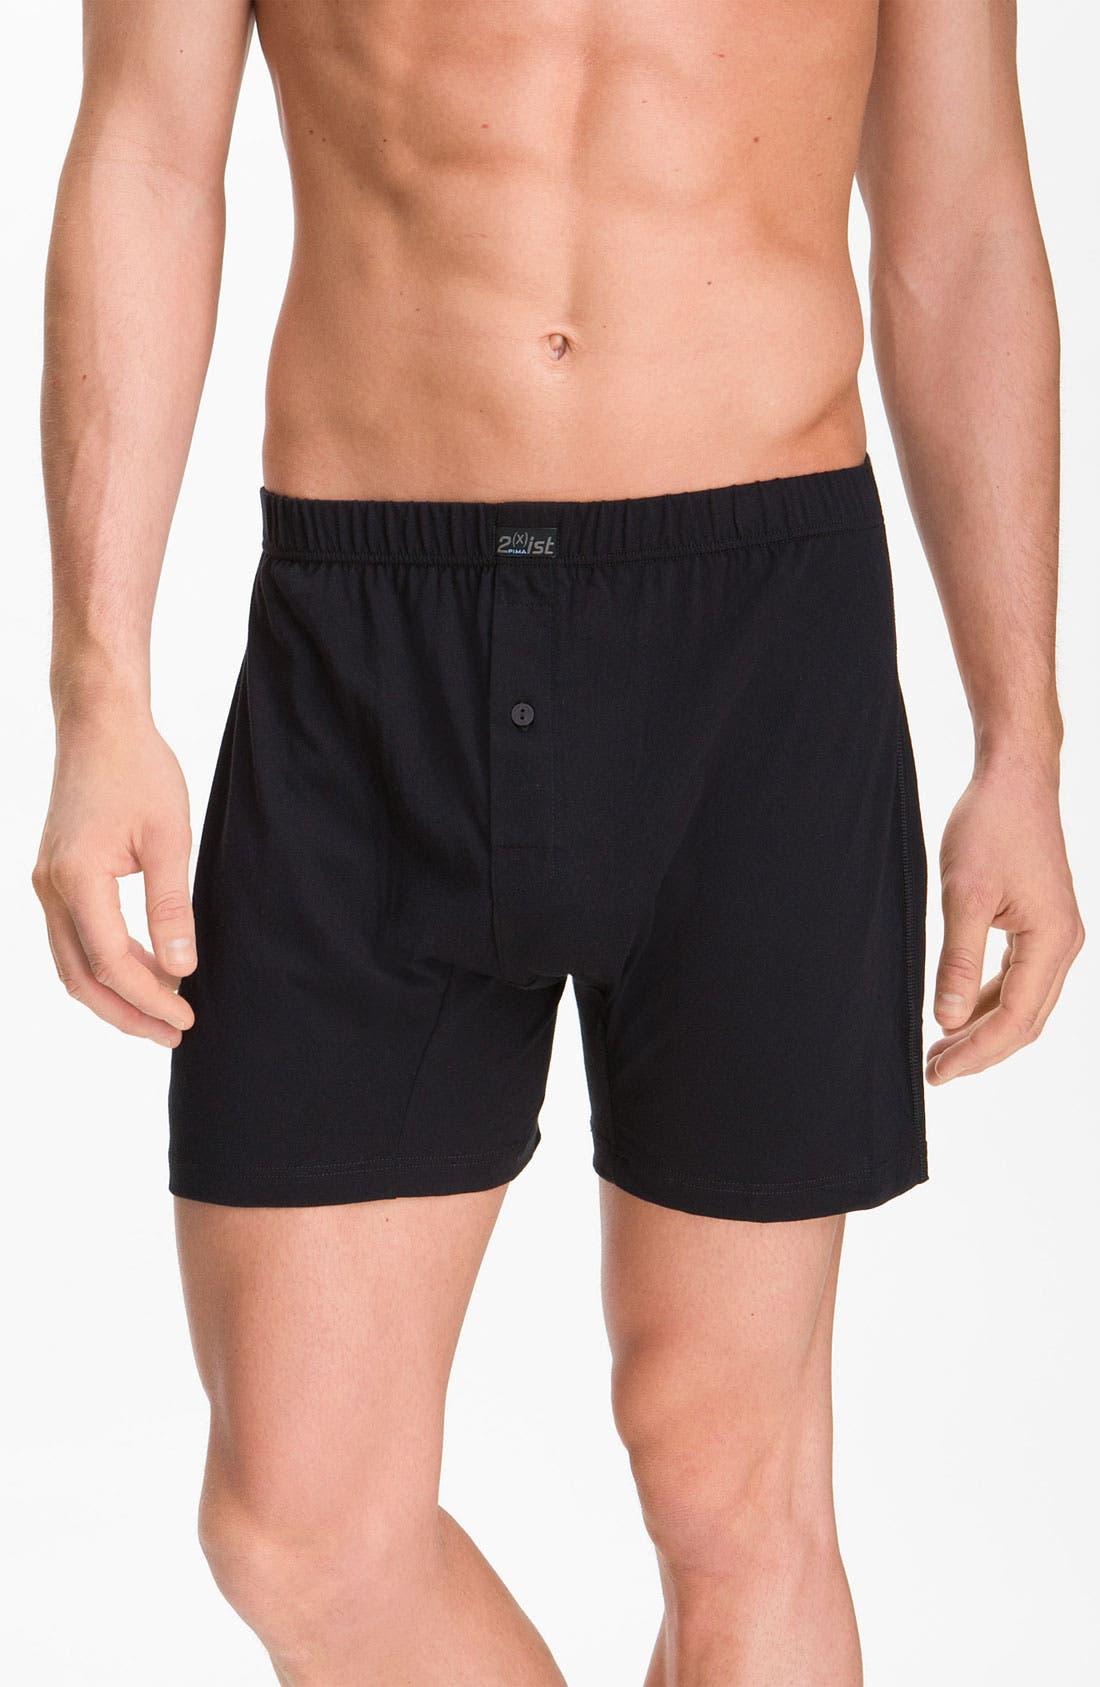 Main Image - 2-Xist Knit Pima Cotton Boxer Shorts